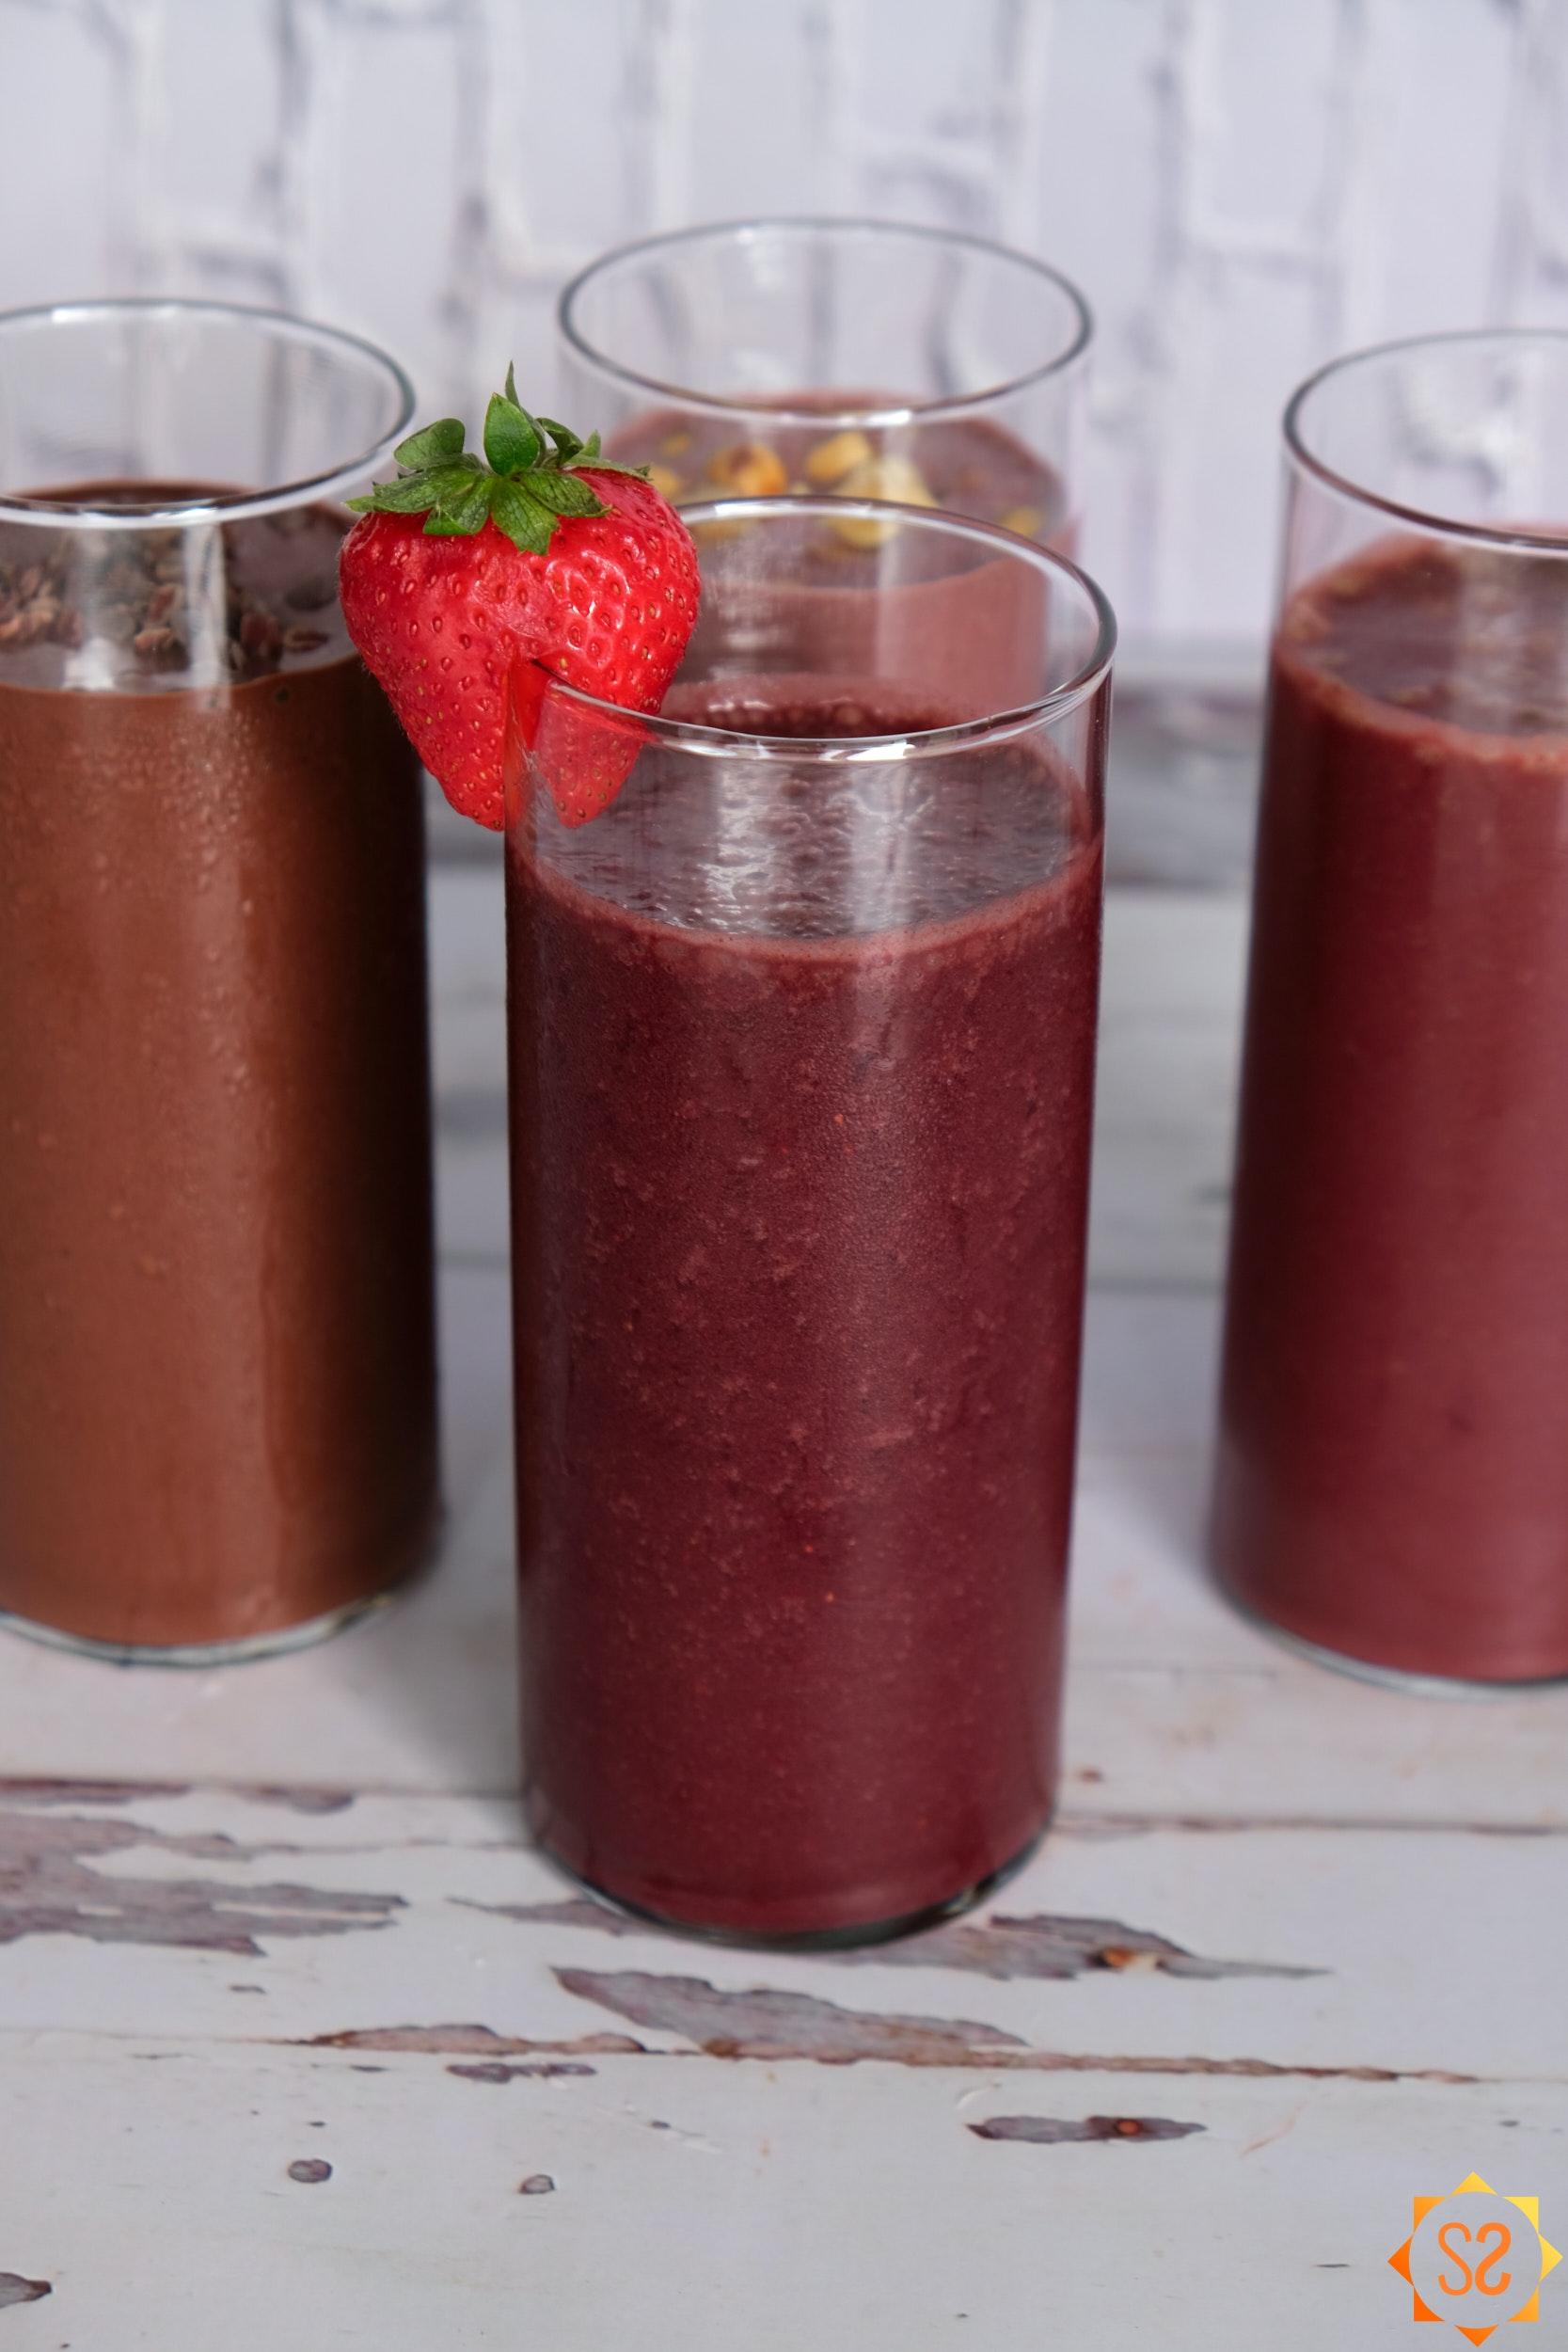 Strawberry açaí smoothie surrounded by three other açaí smoothies